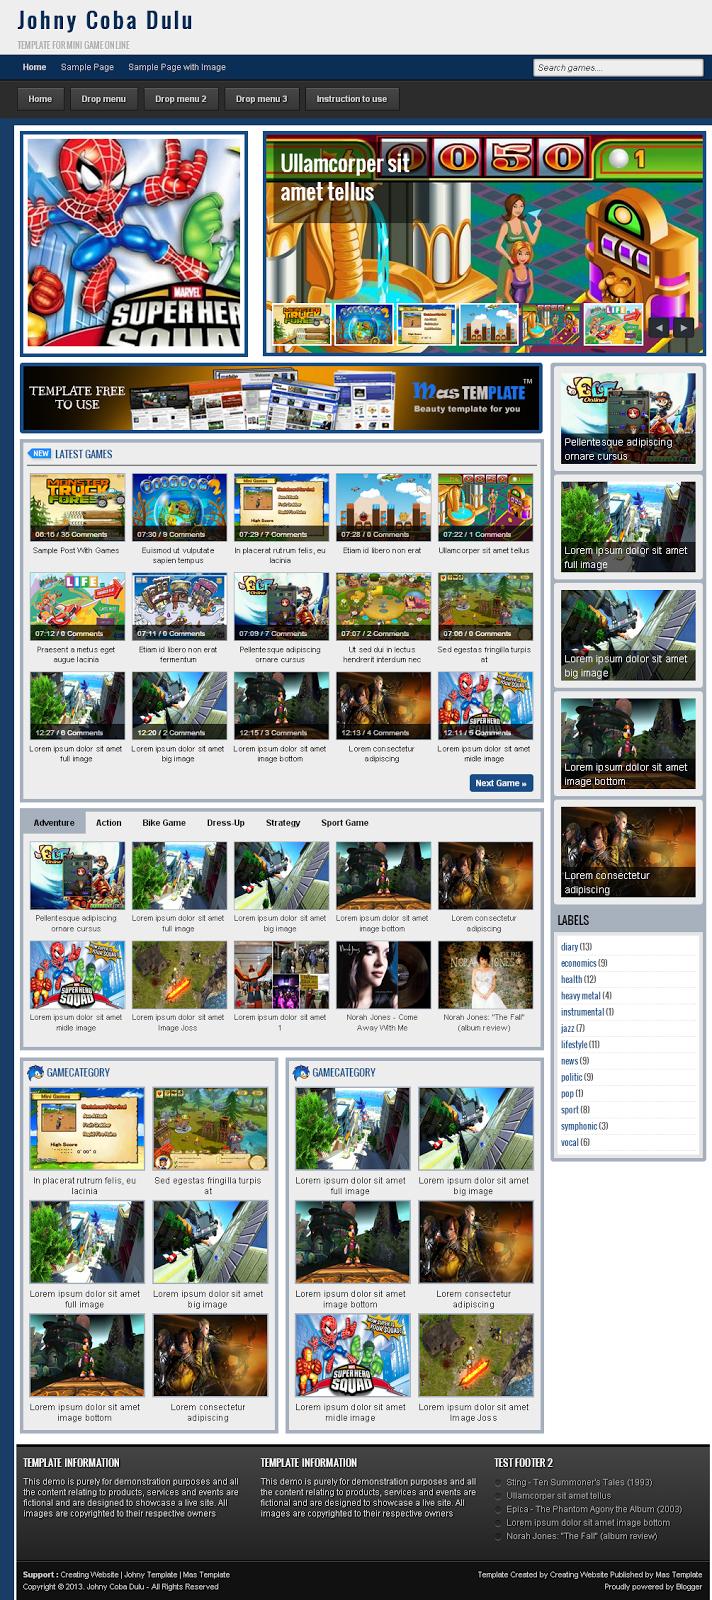 Mẫu giao diện blogspot trang game online